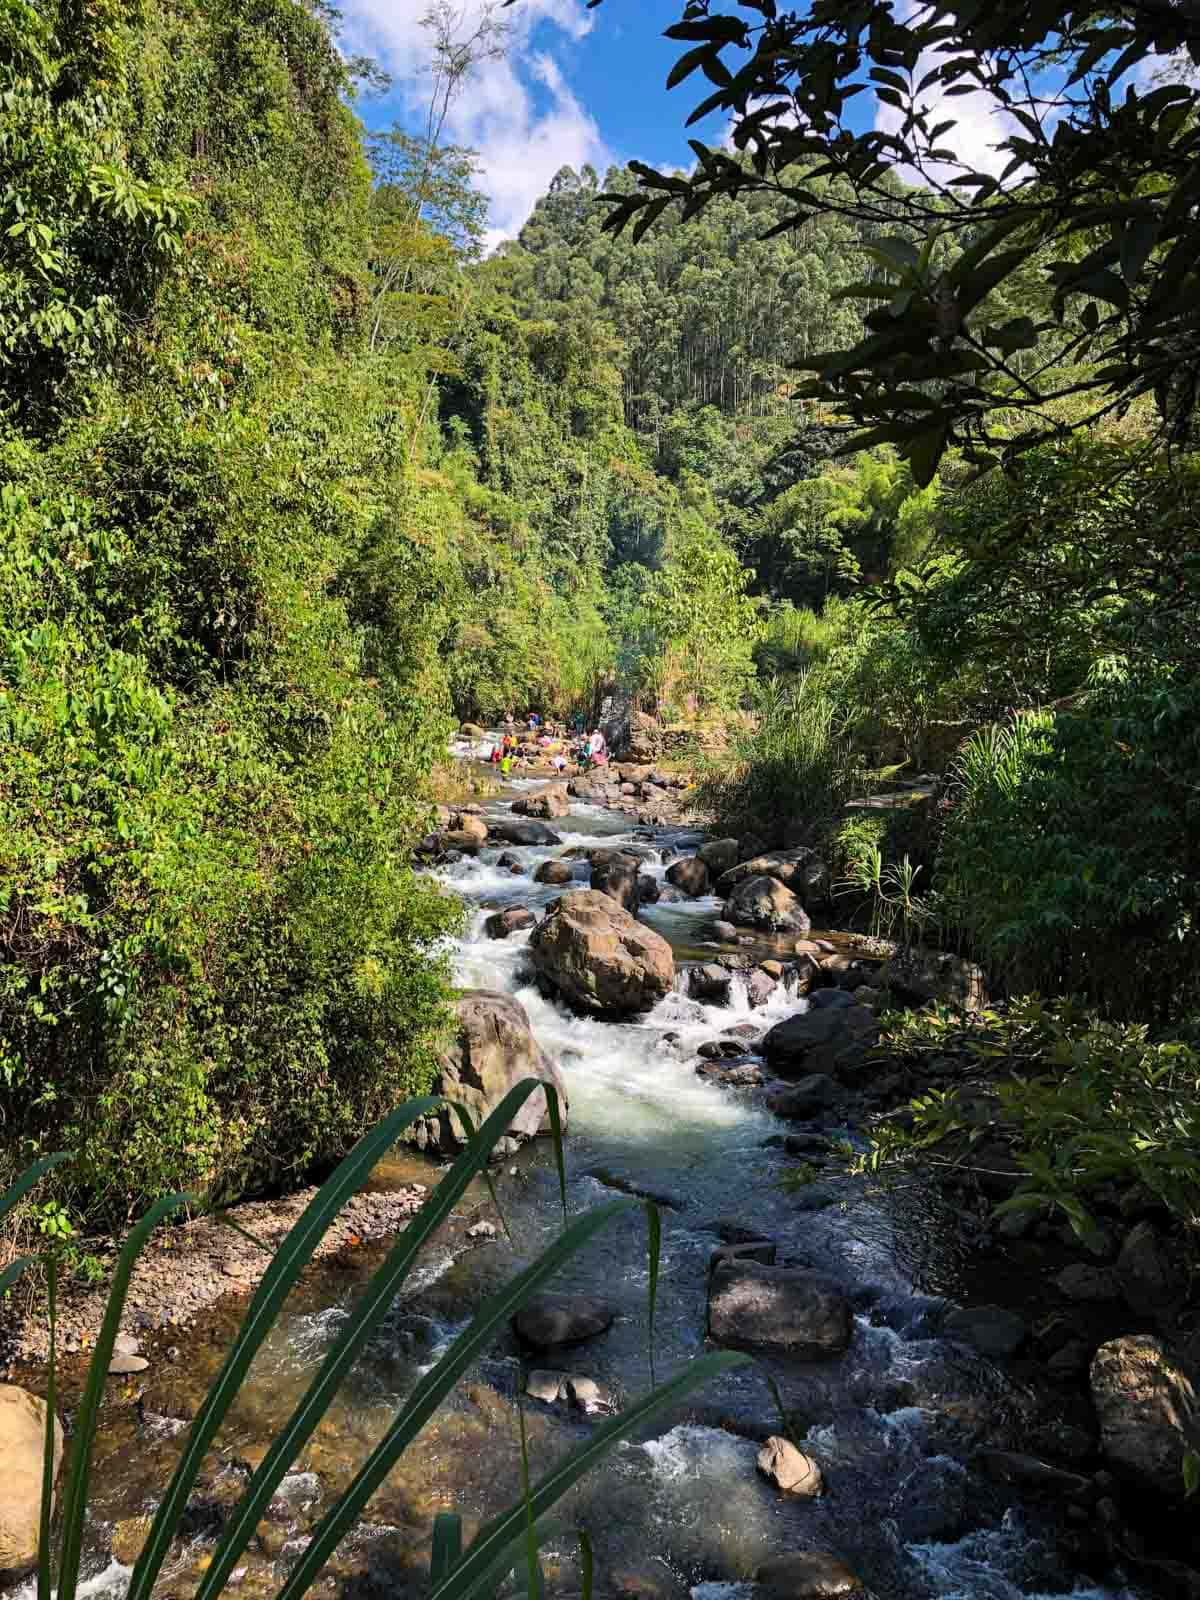 A river in Jardin, Colombia.